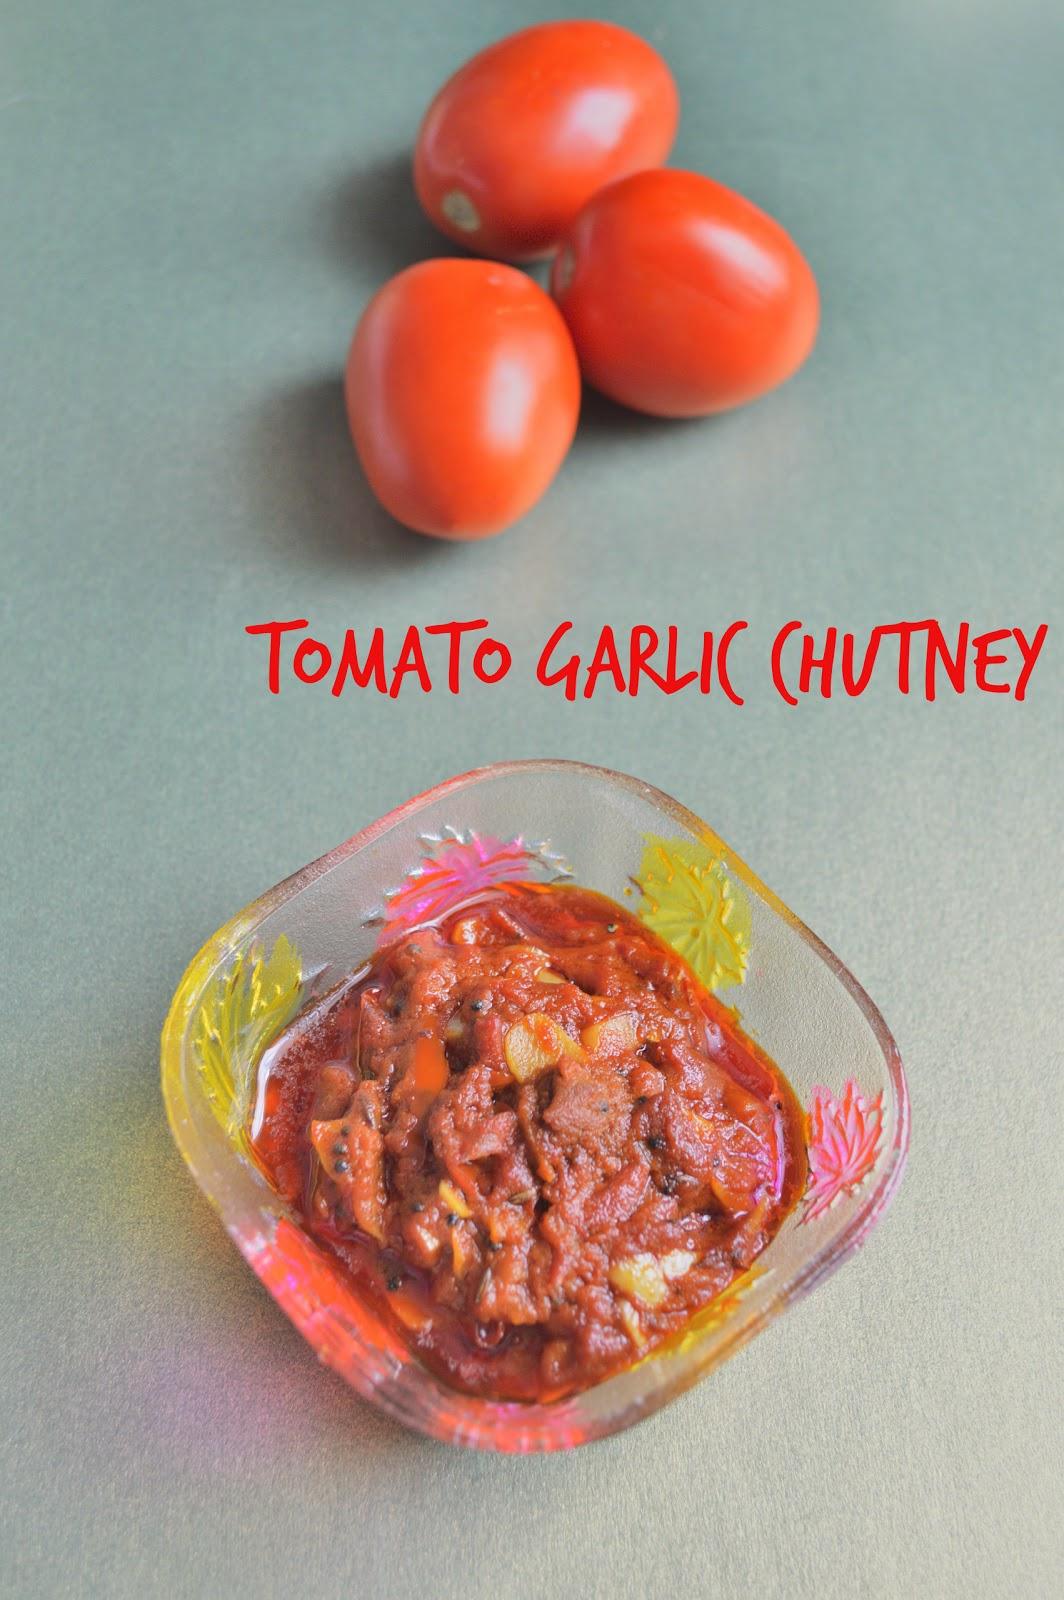 easy tomato chutney without onions